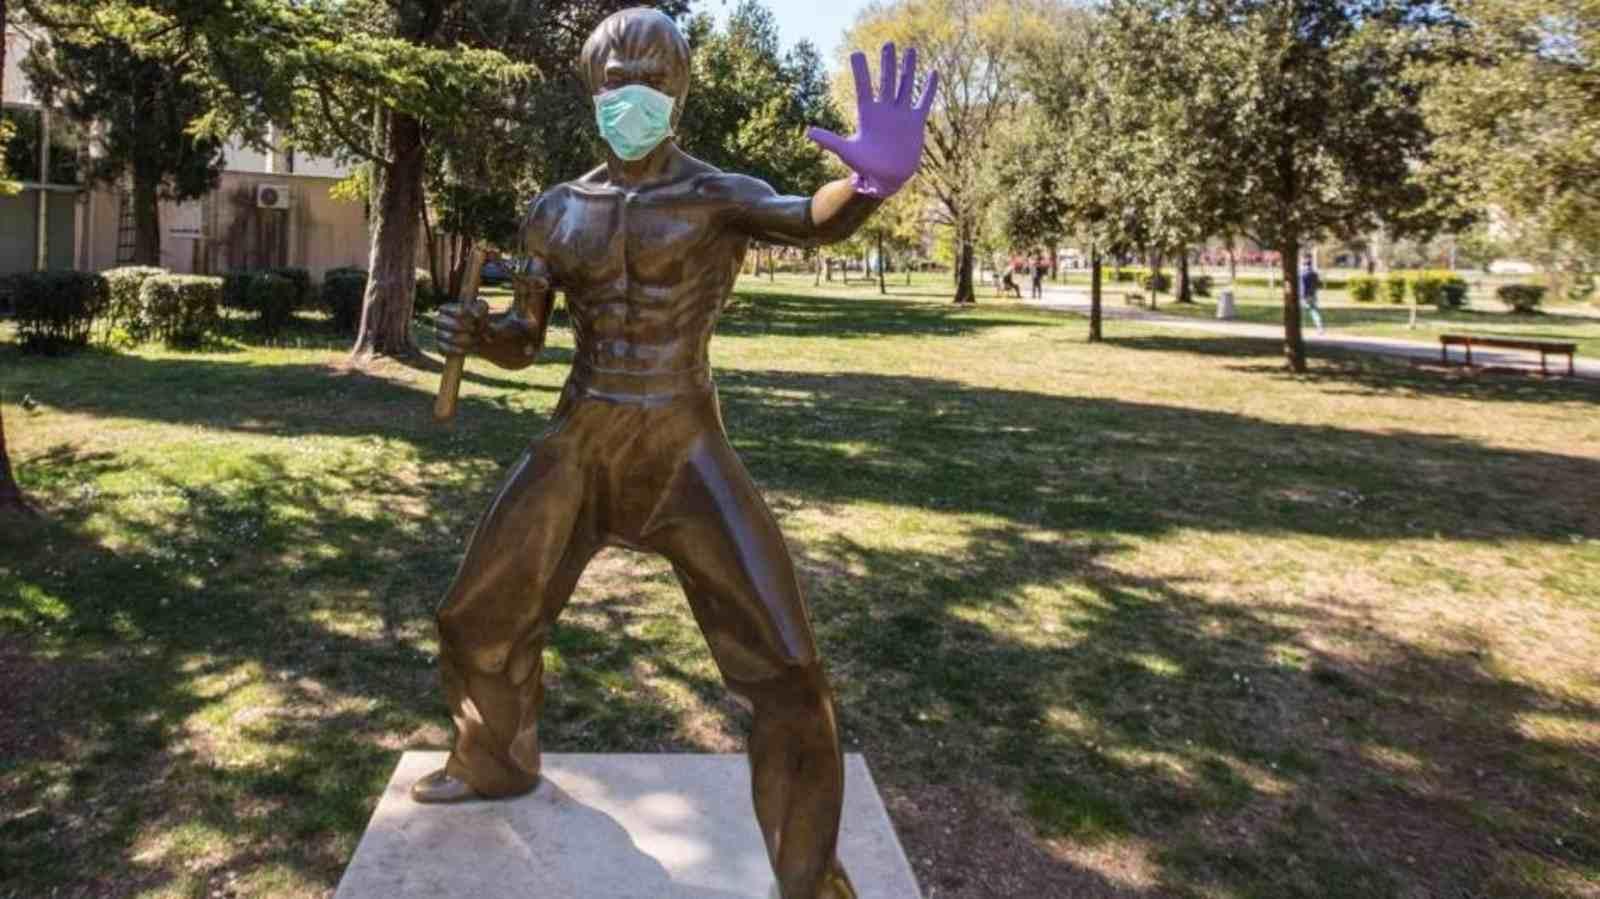 Photo: Bruce Lee statue in Mostar, Bosnia and Hercegovina. Credit: reddit r/europe